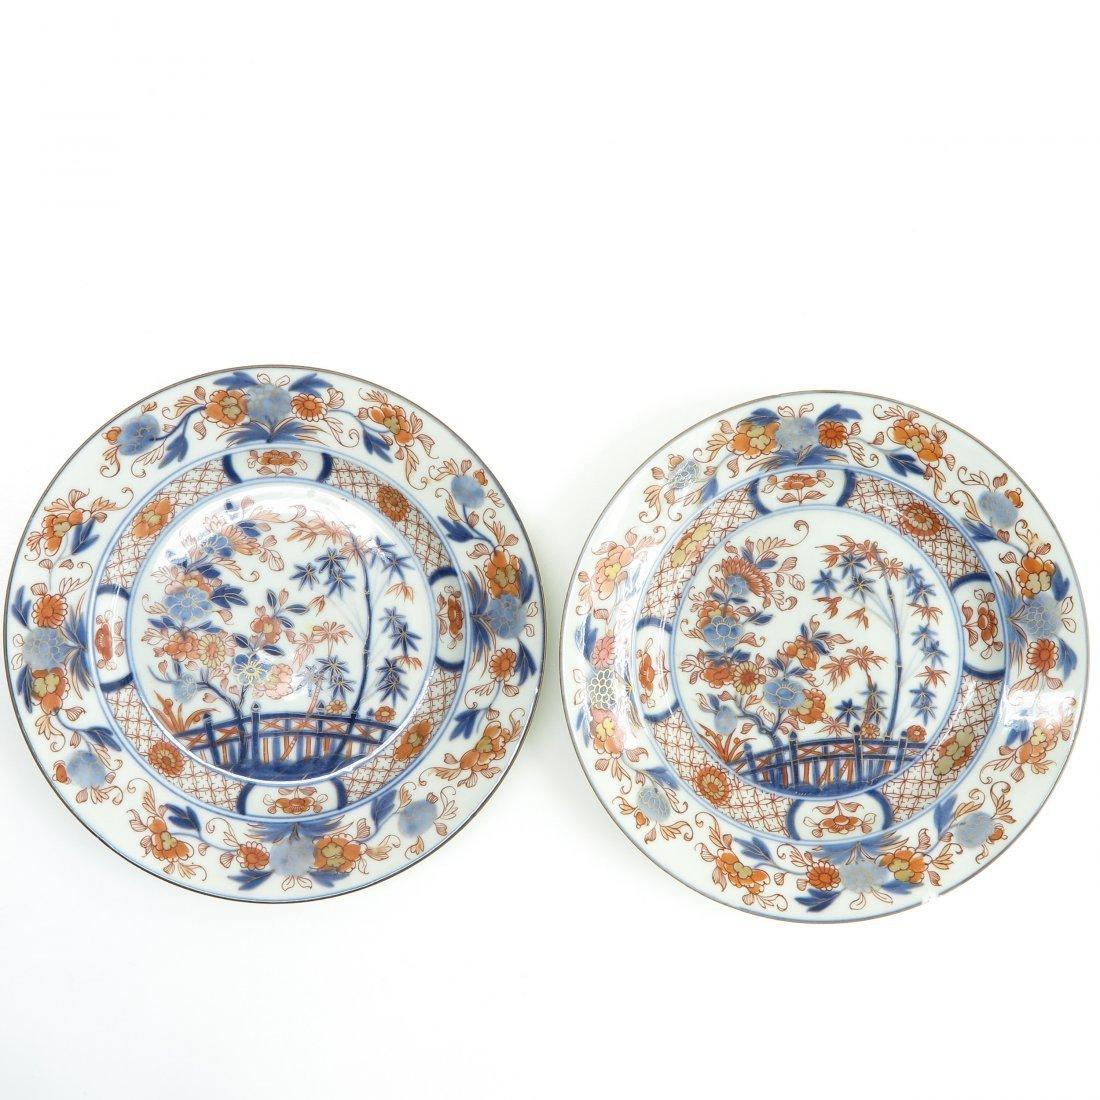 Lot of 18th Century Imari Decor Plates